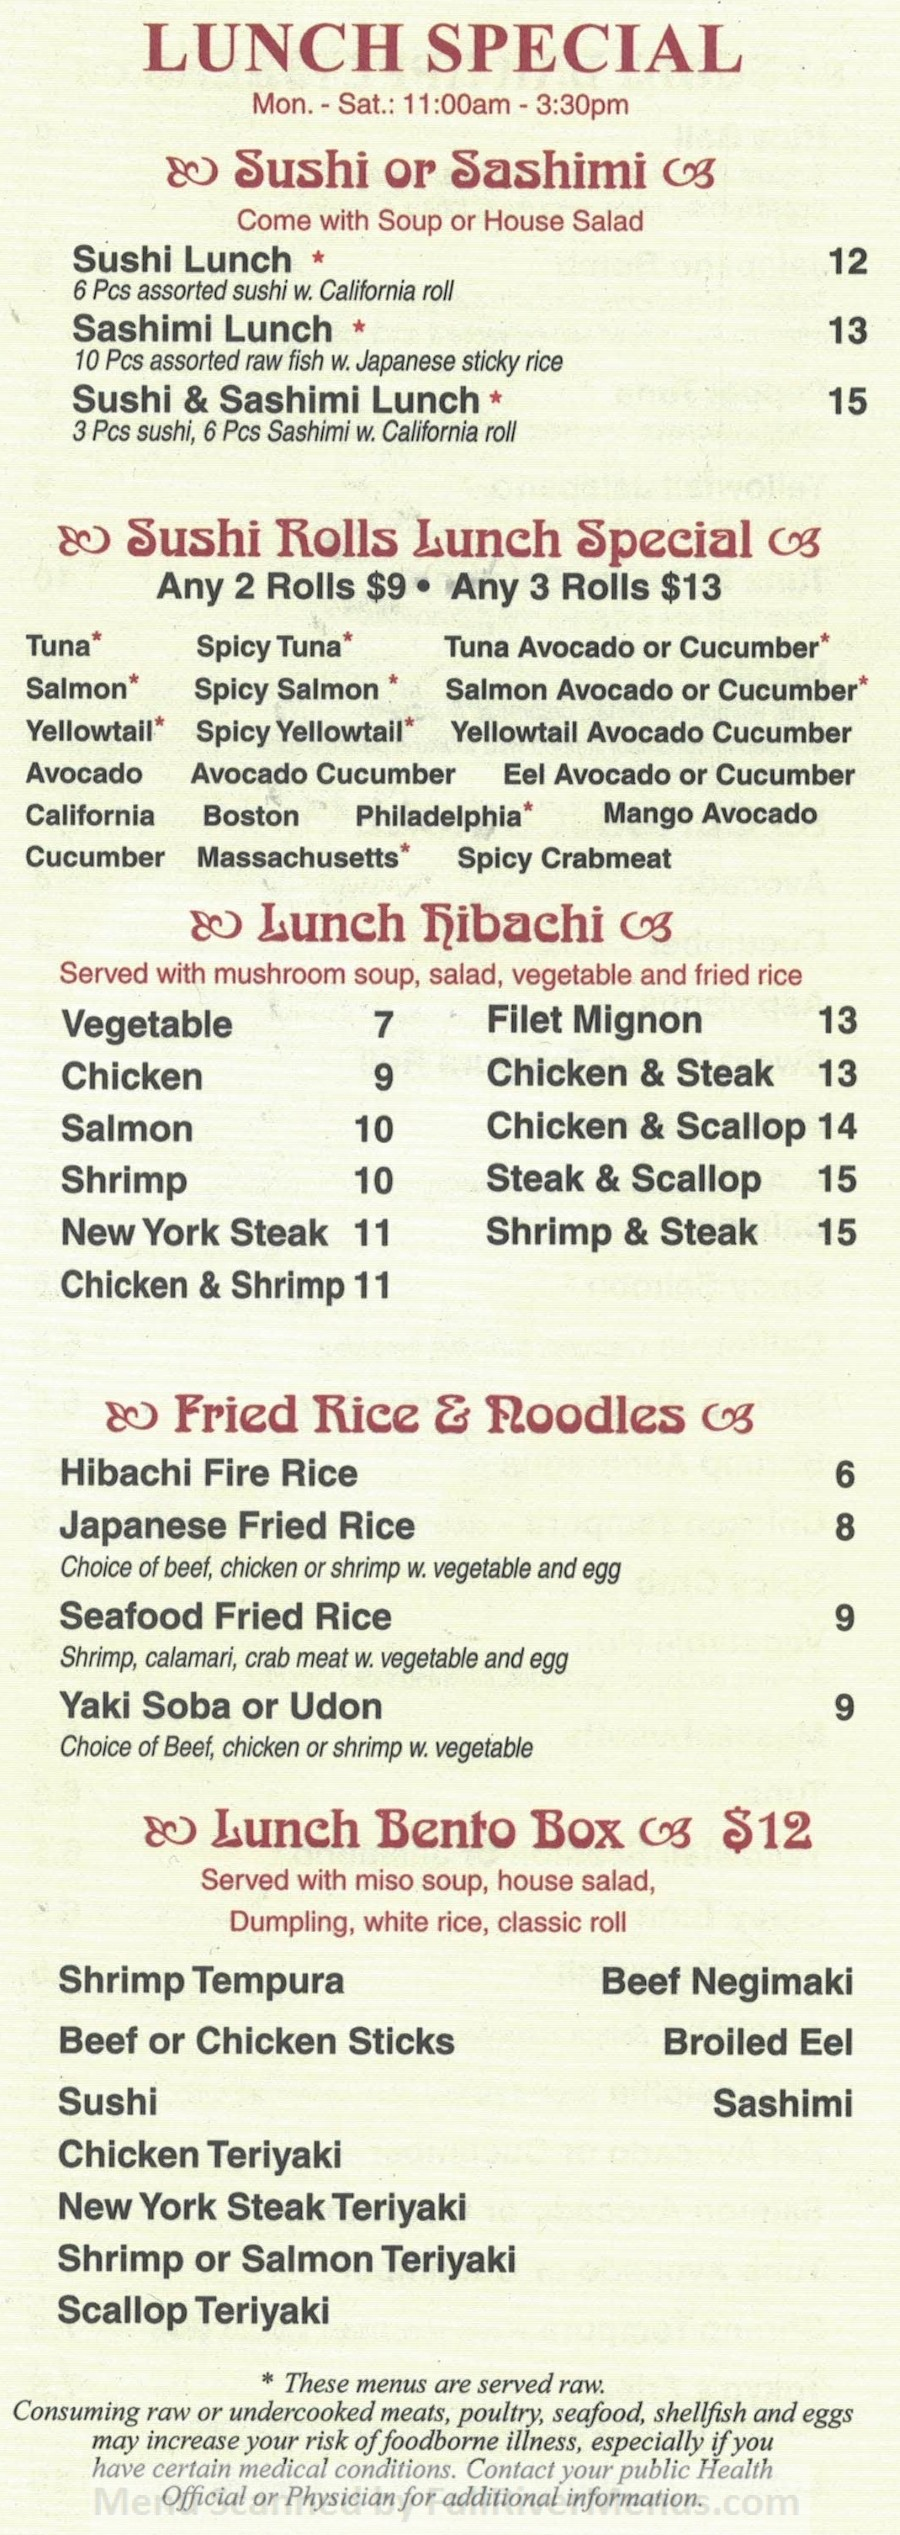 Tokyo Steakhouse Fall River  Fall River Restaurants